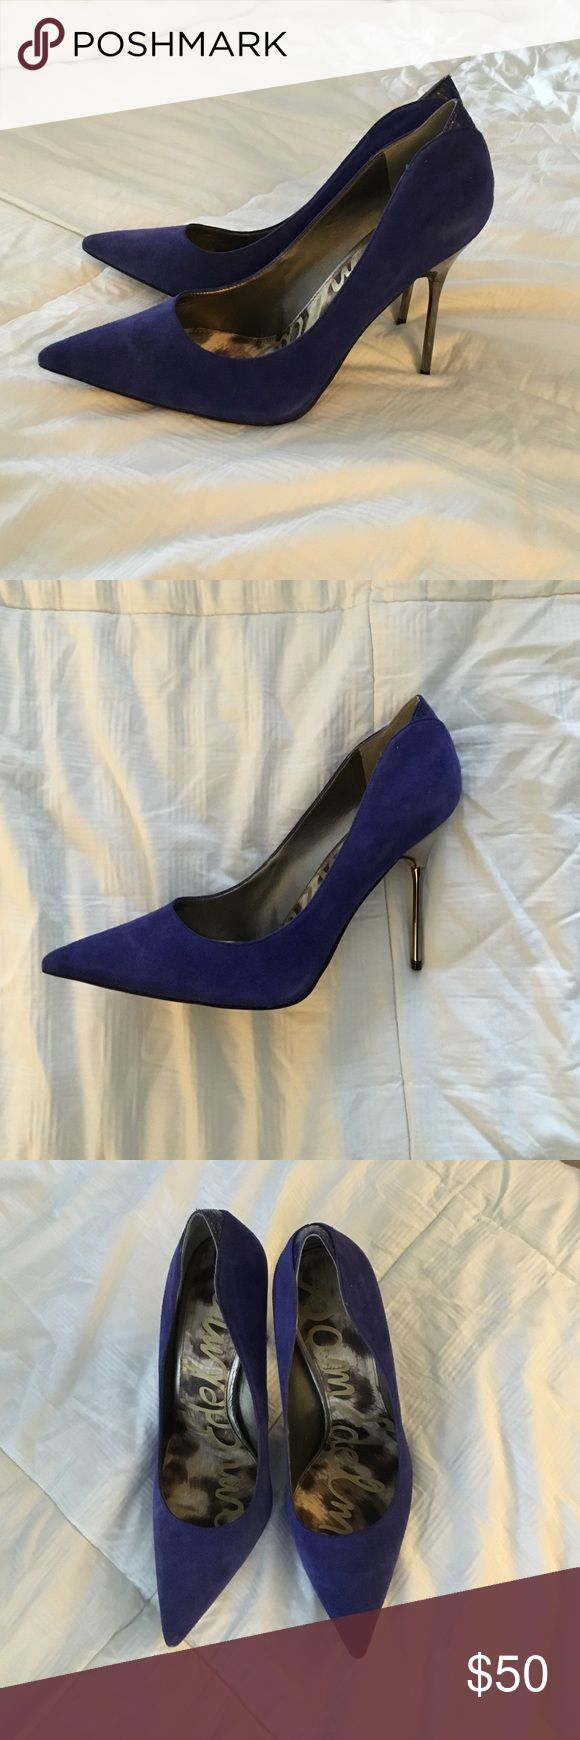 Sam Edelman Heels Danielle Heeled Blue Point Court Cobalt Blue Pumps Sam Edelman Shoes Heels